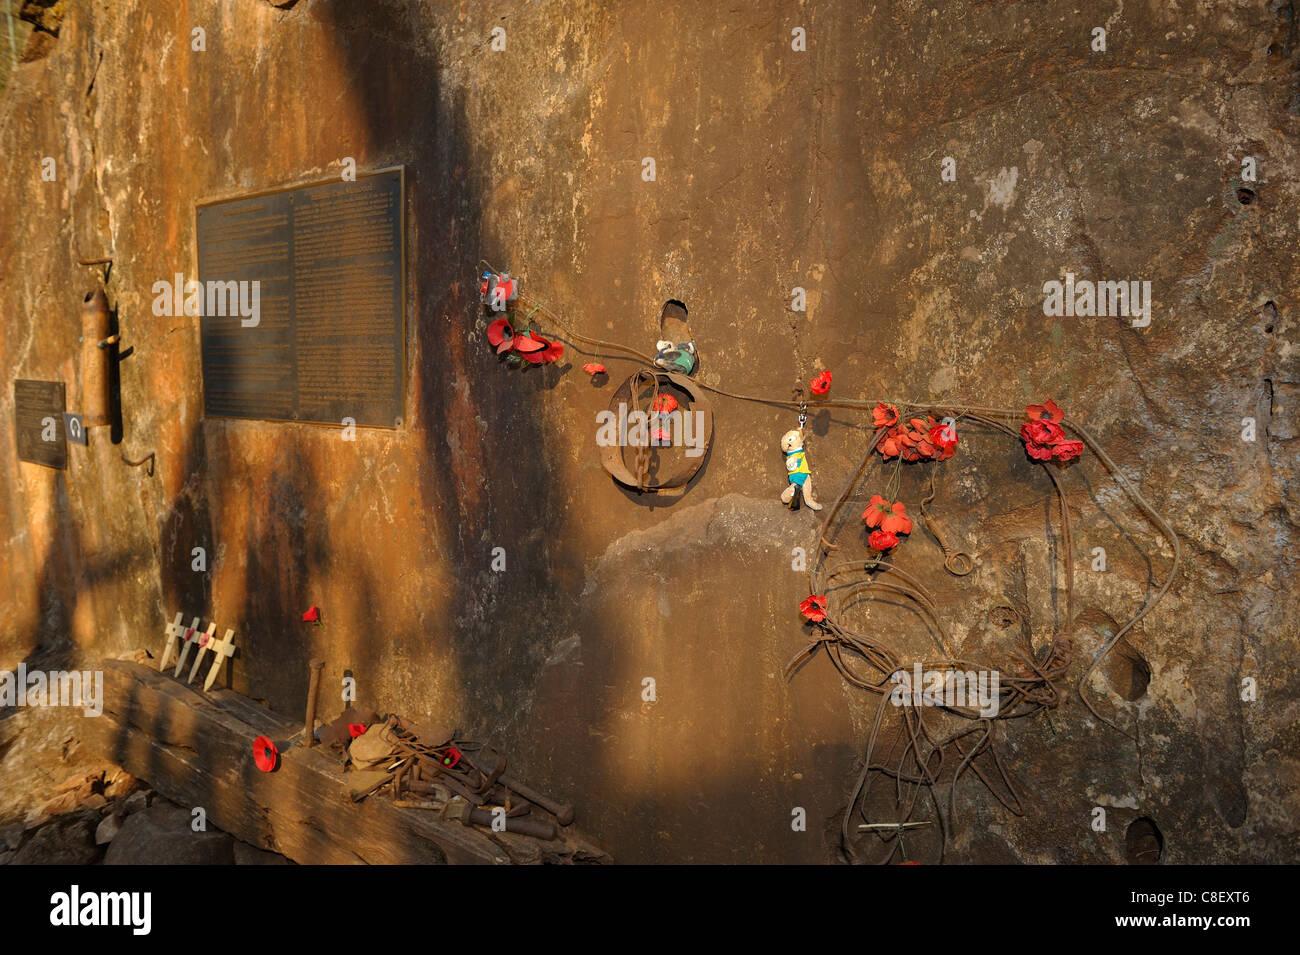 Memorial Plaque, Burma Railway, Death Railway, Hellfire Pass, Thailand, Asia, - Stock Image